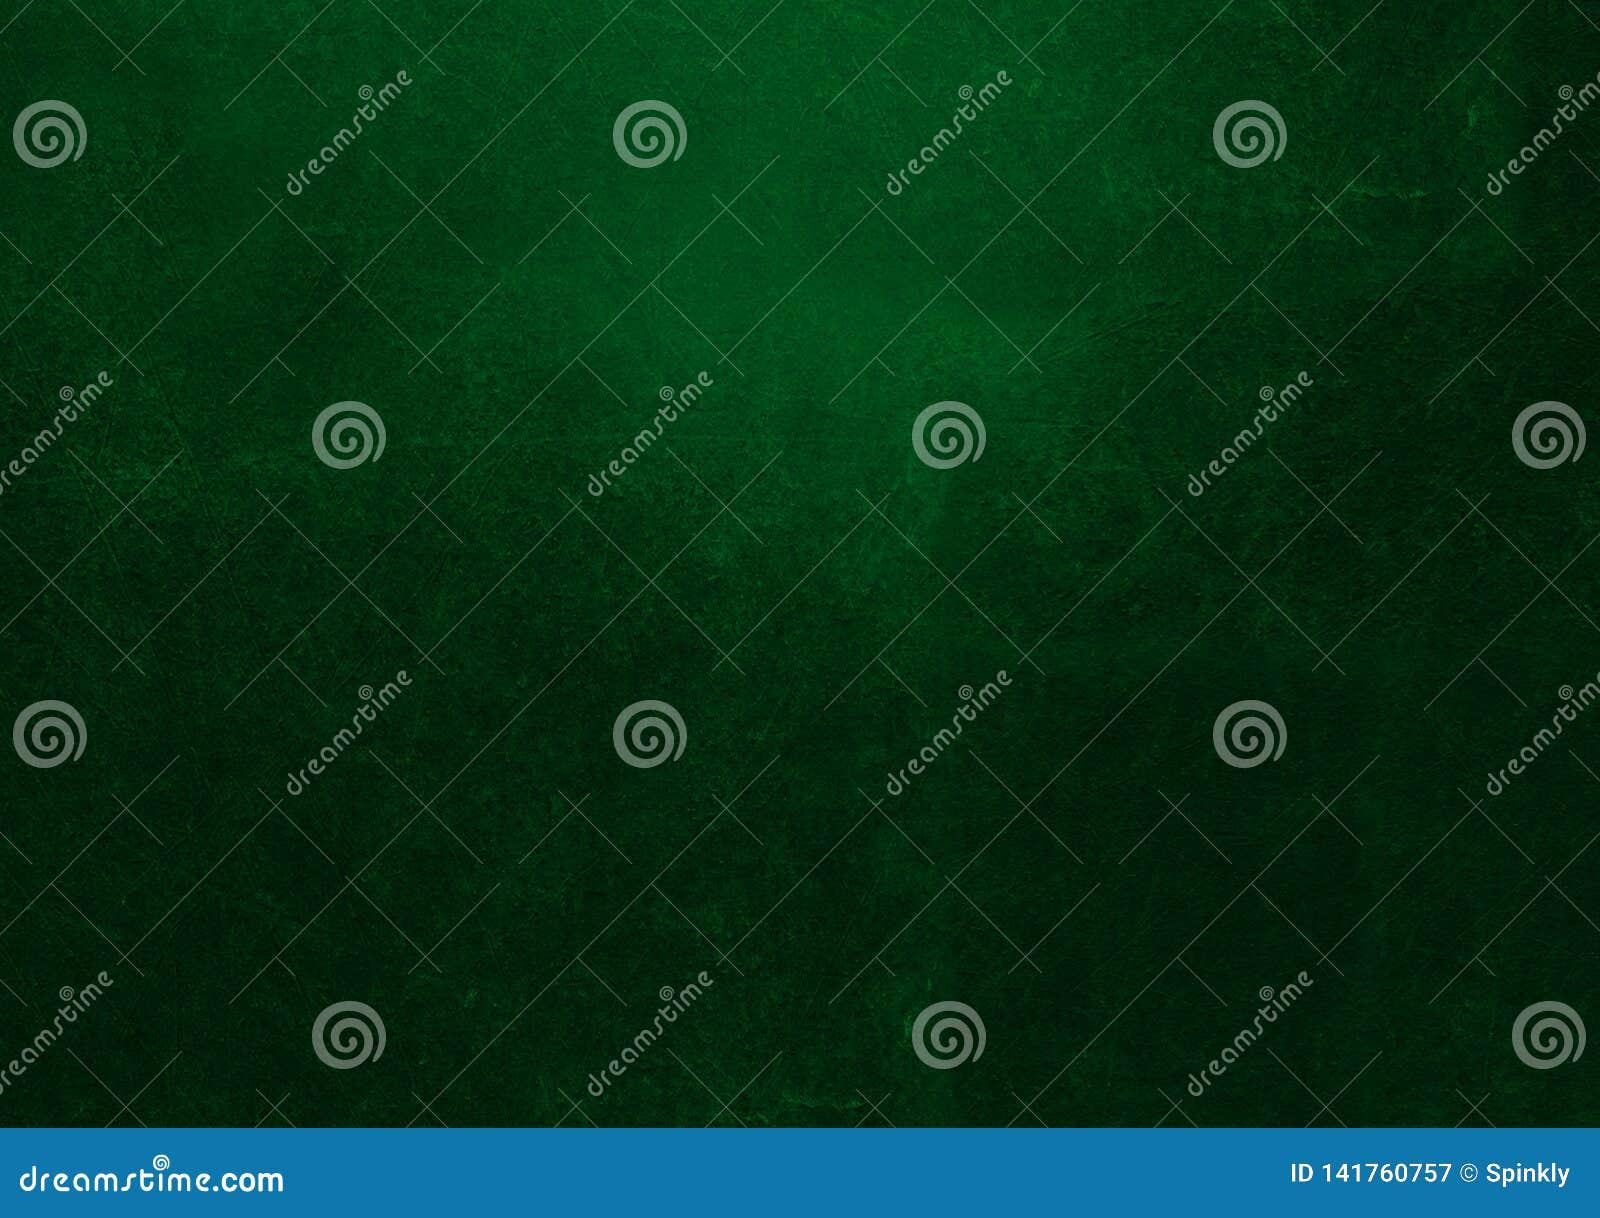 Green textured background wallpaper design